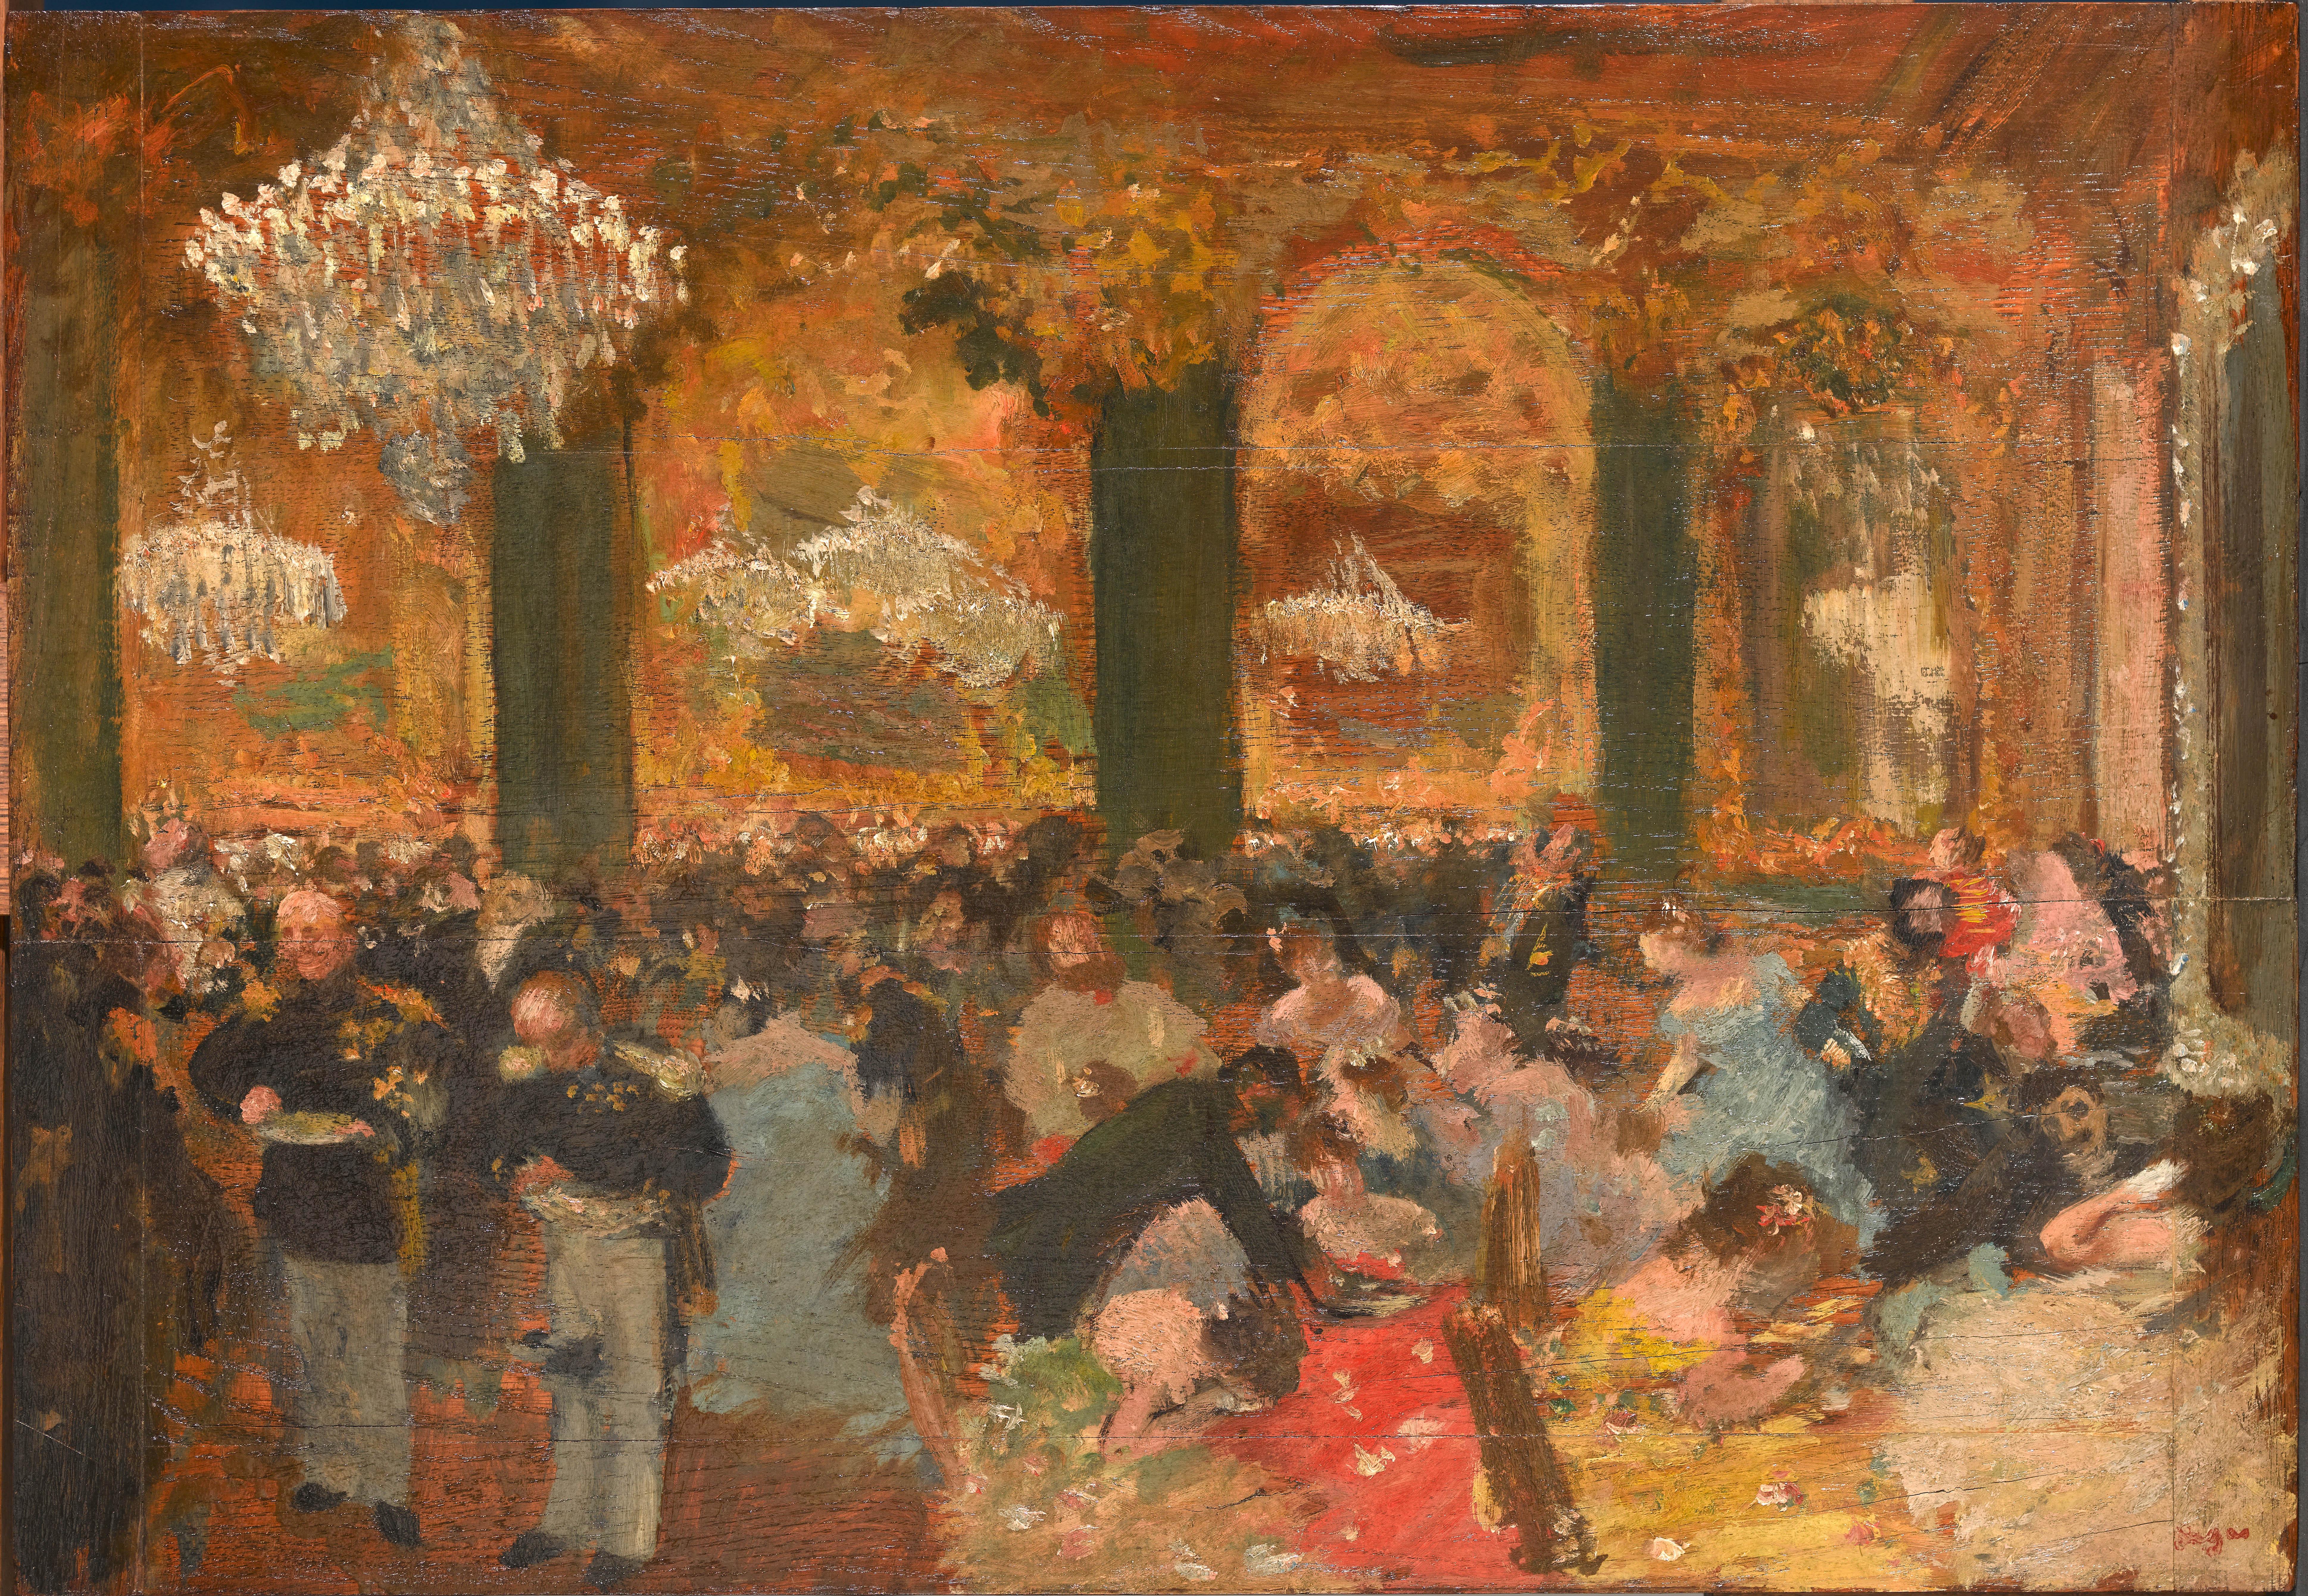 mnr/MNR00226/MNR226-copyright_Musee_d_Orsay_distribution_RMN-Grand_Palais_Patrice_Schmidt.jpg